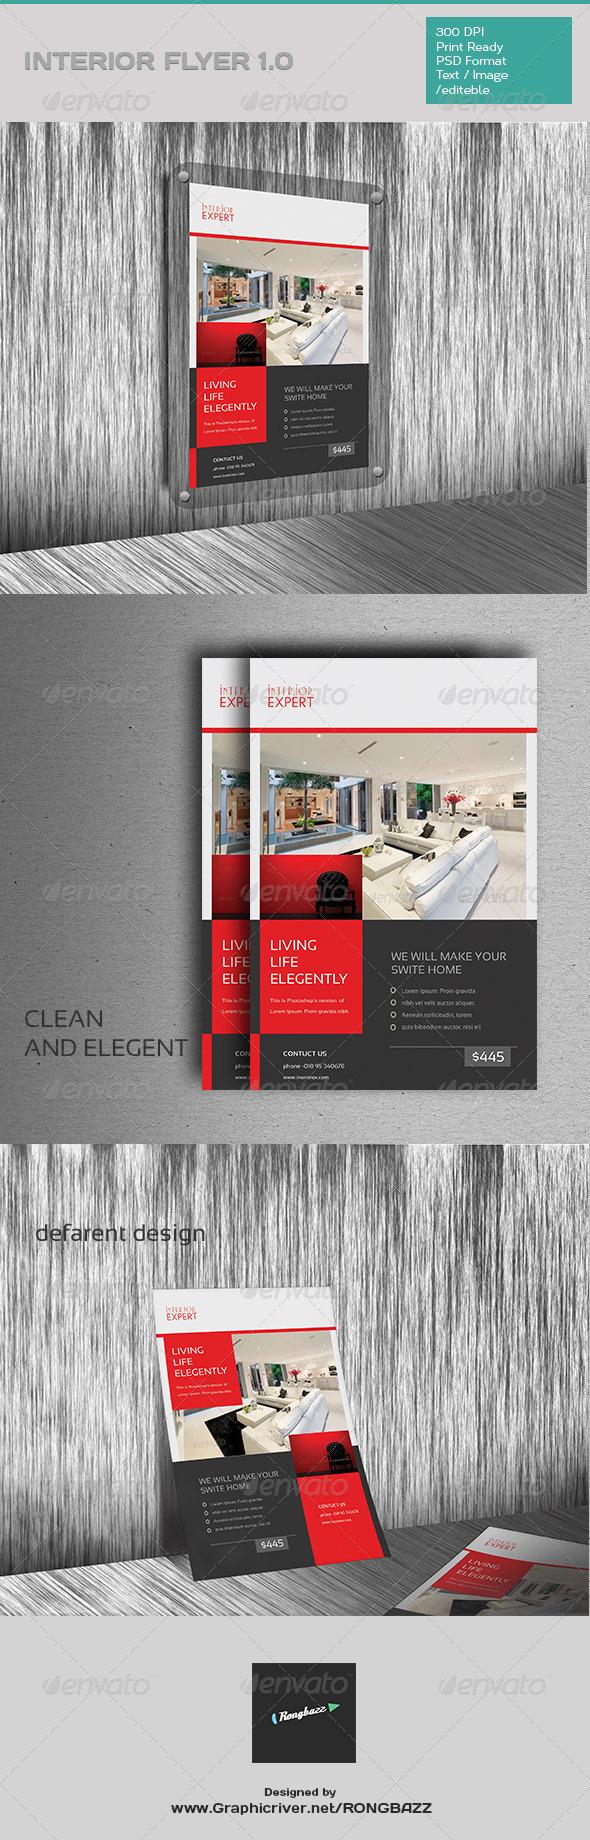 GraphicRiver Interior Flyer 1.0 7755460